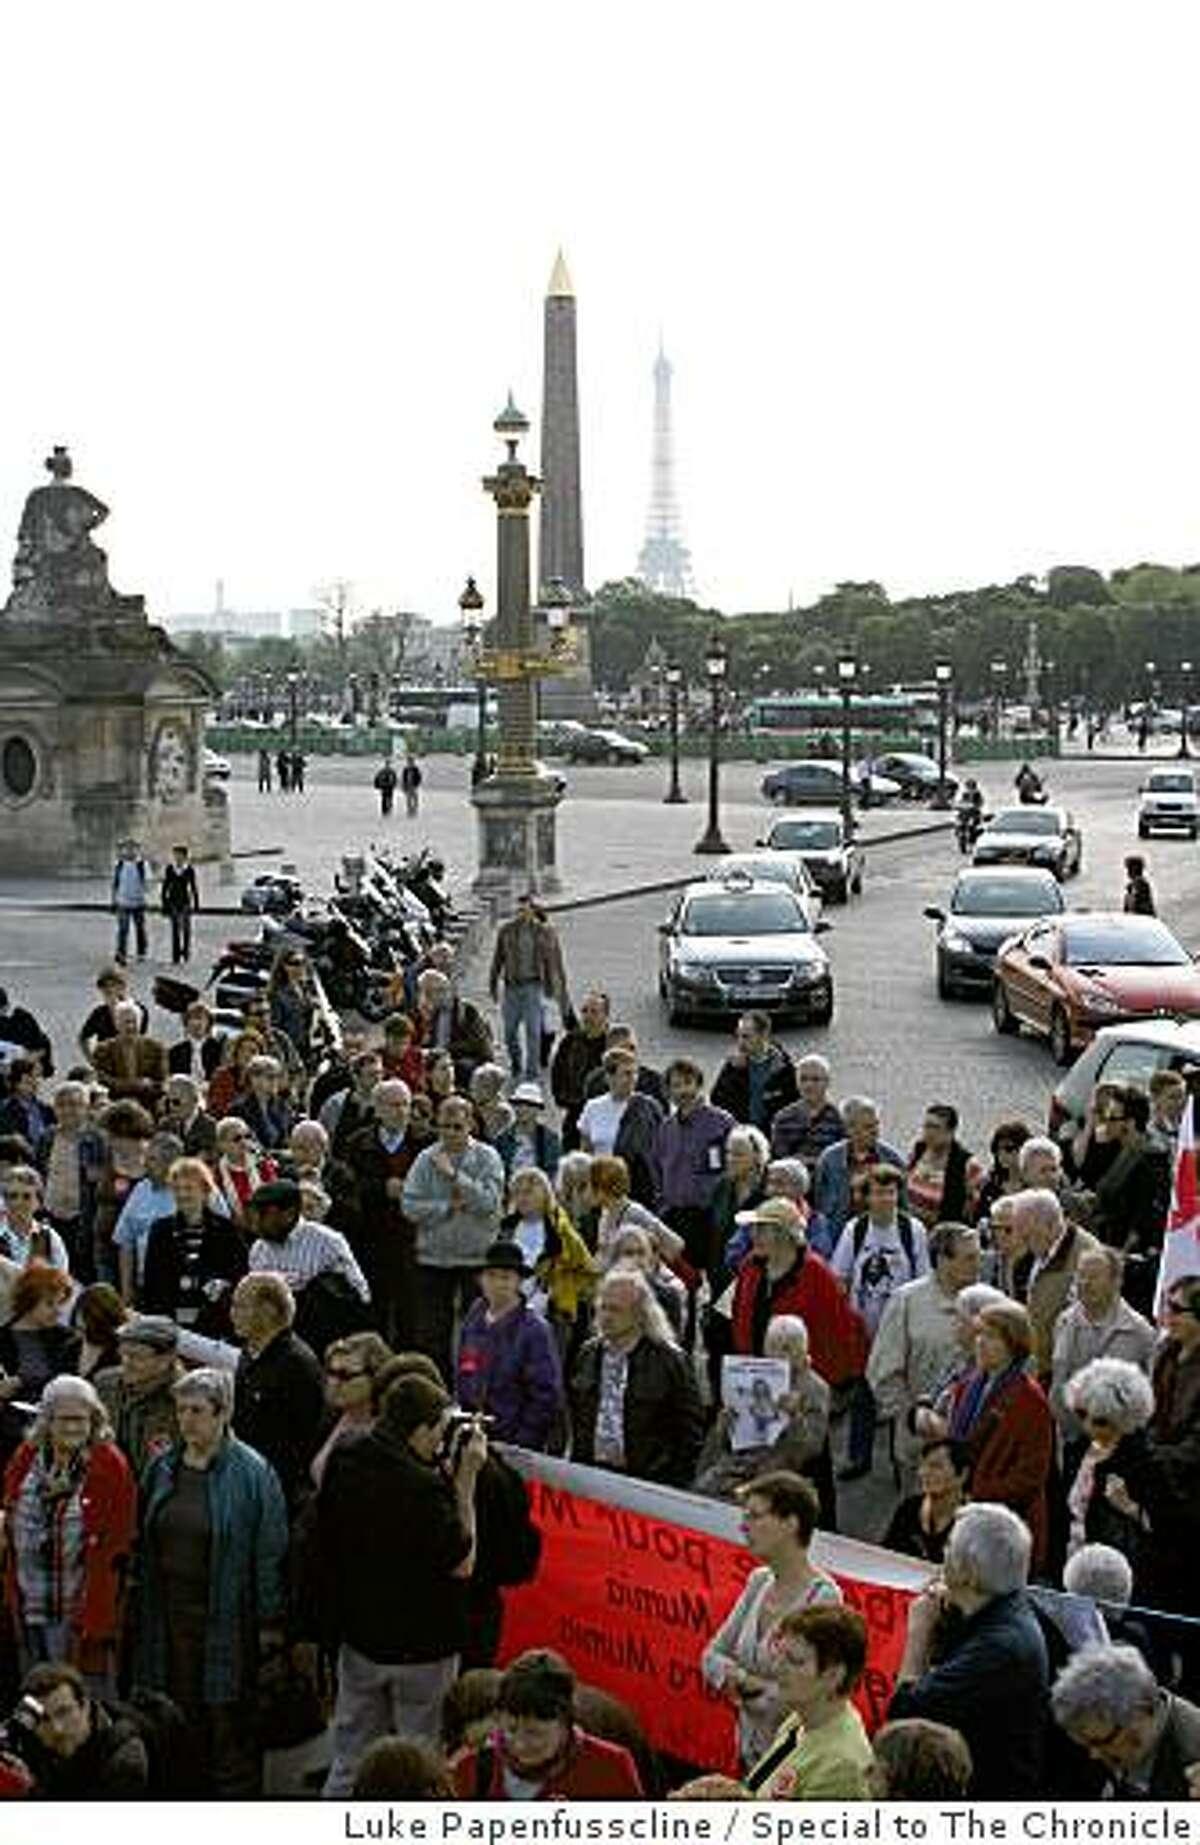 Paris rally last month supporting Mumia Abu-Jamal at Place de la Concorde.